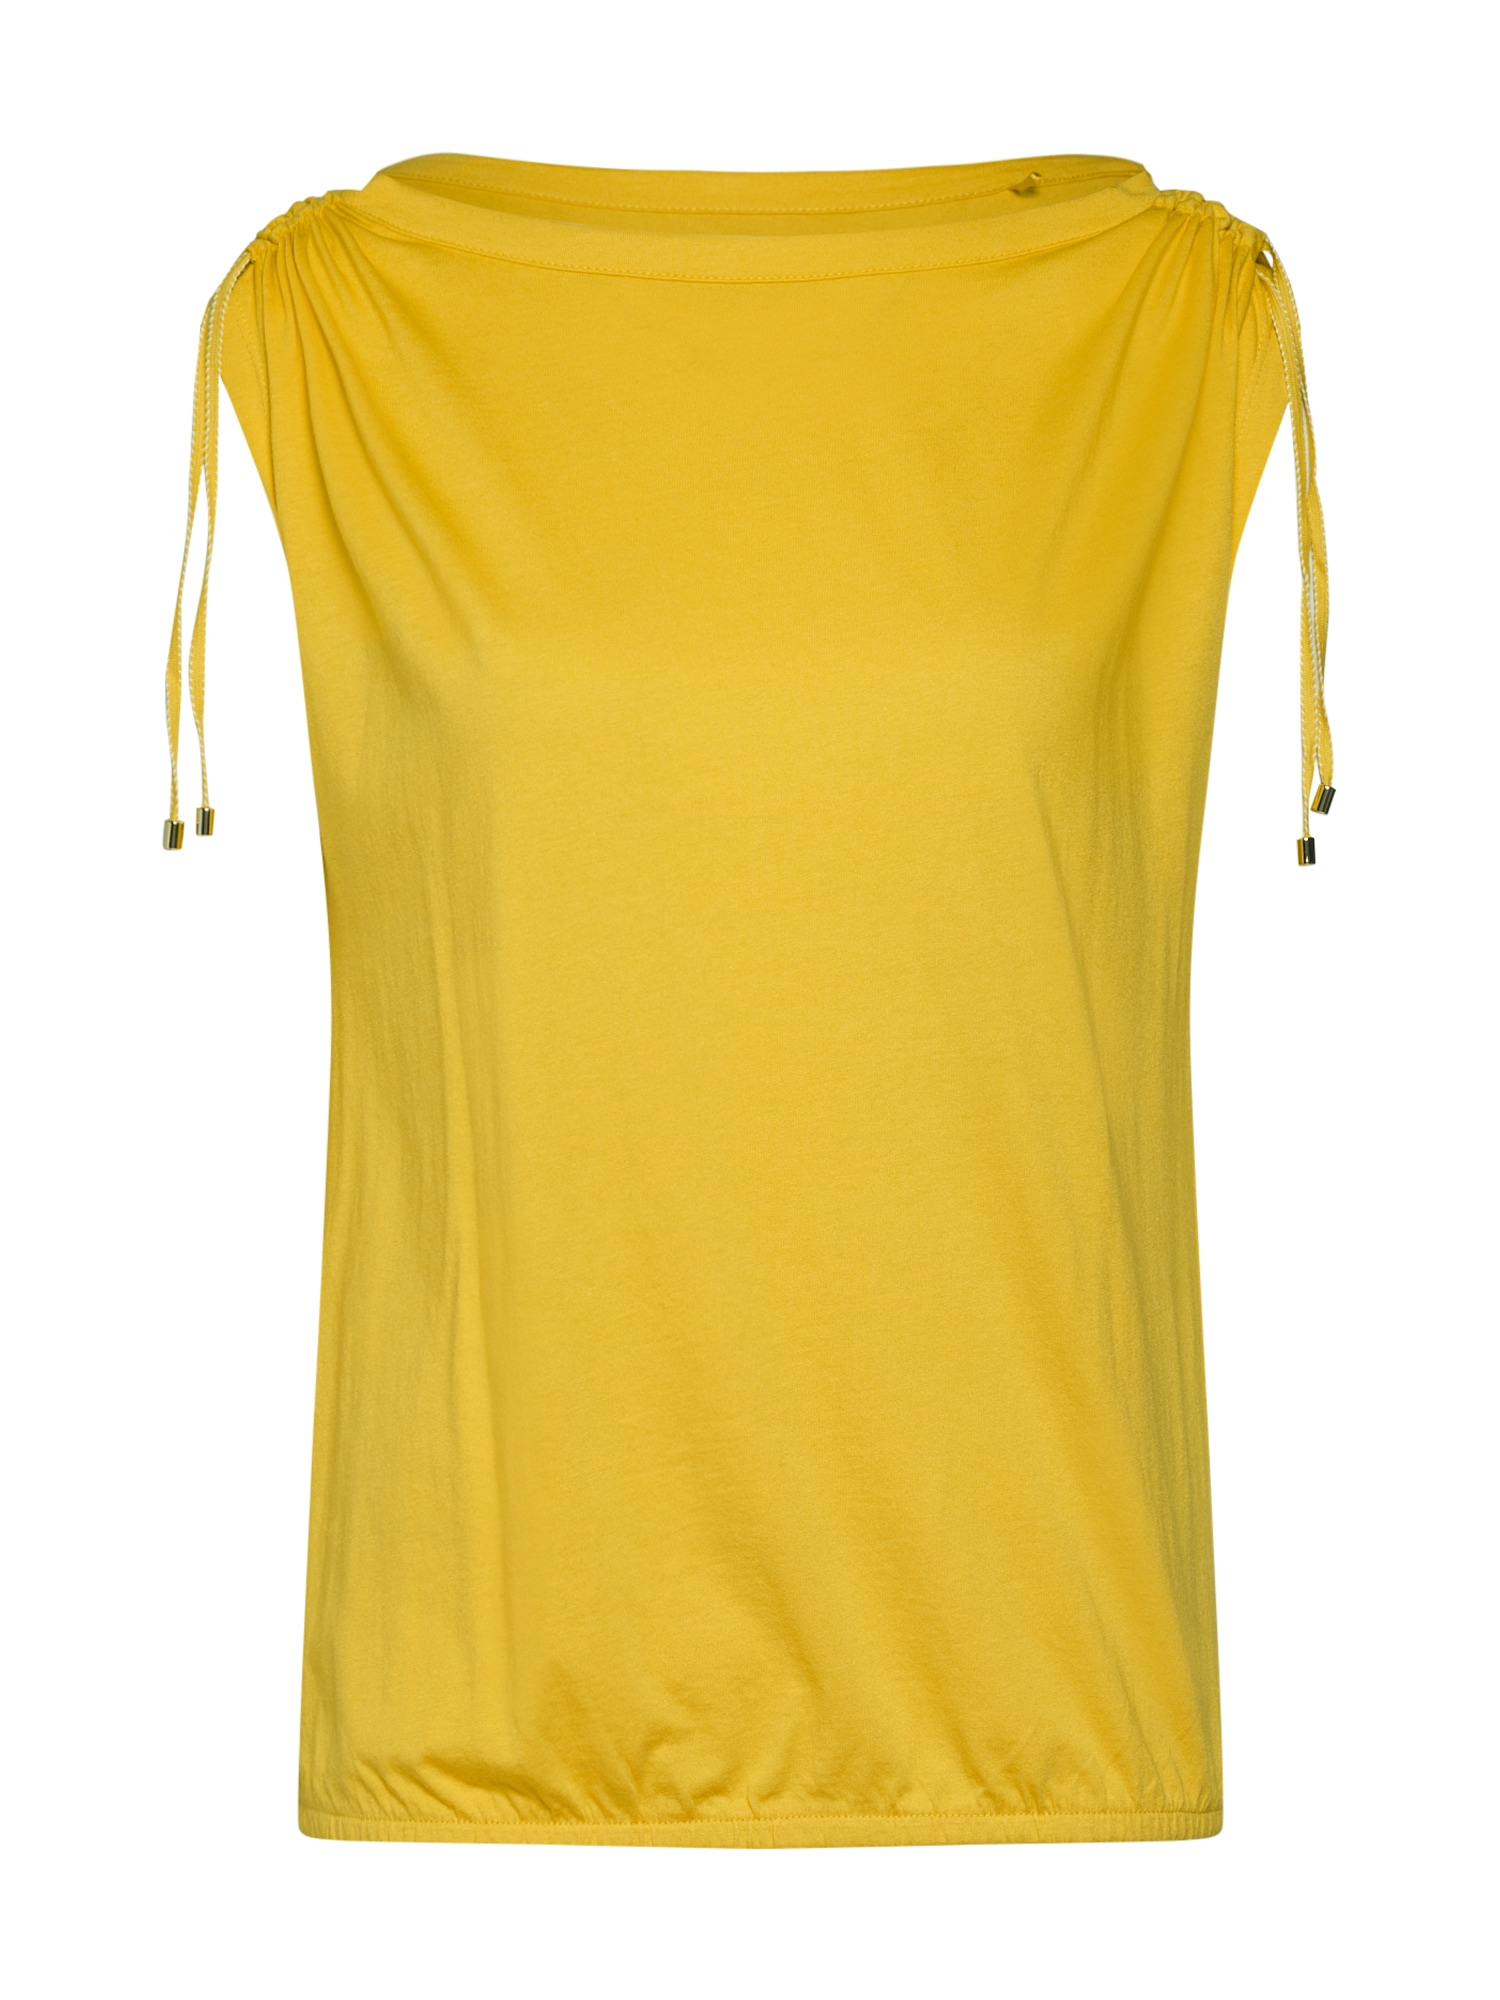 Tričko žlutá S.Oliver RED LABEL